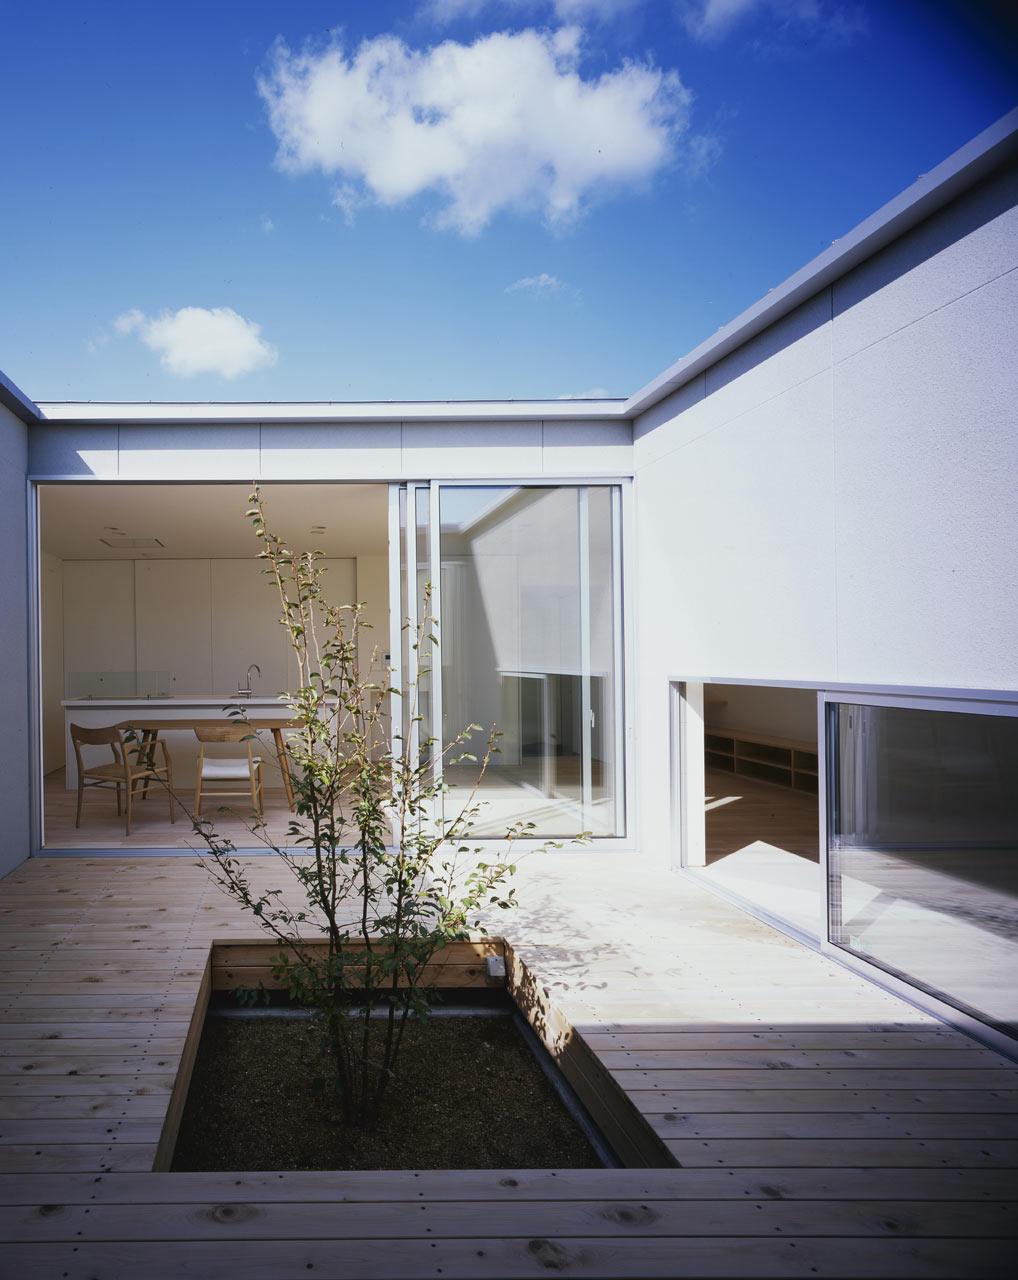 Naoko-Horibe-Naruto-House-12-courtyard